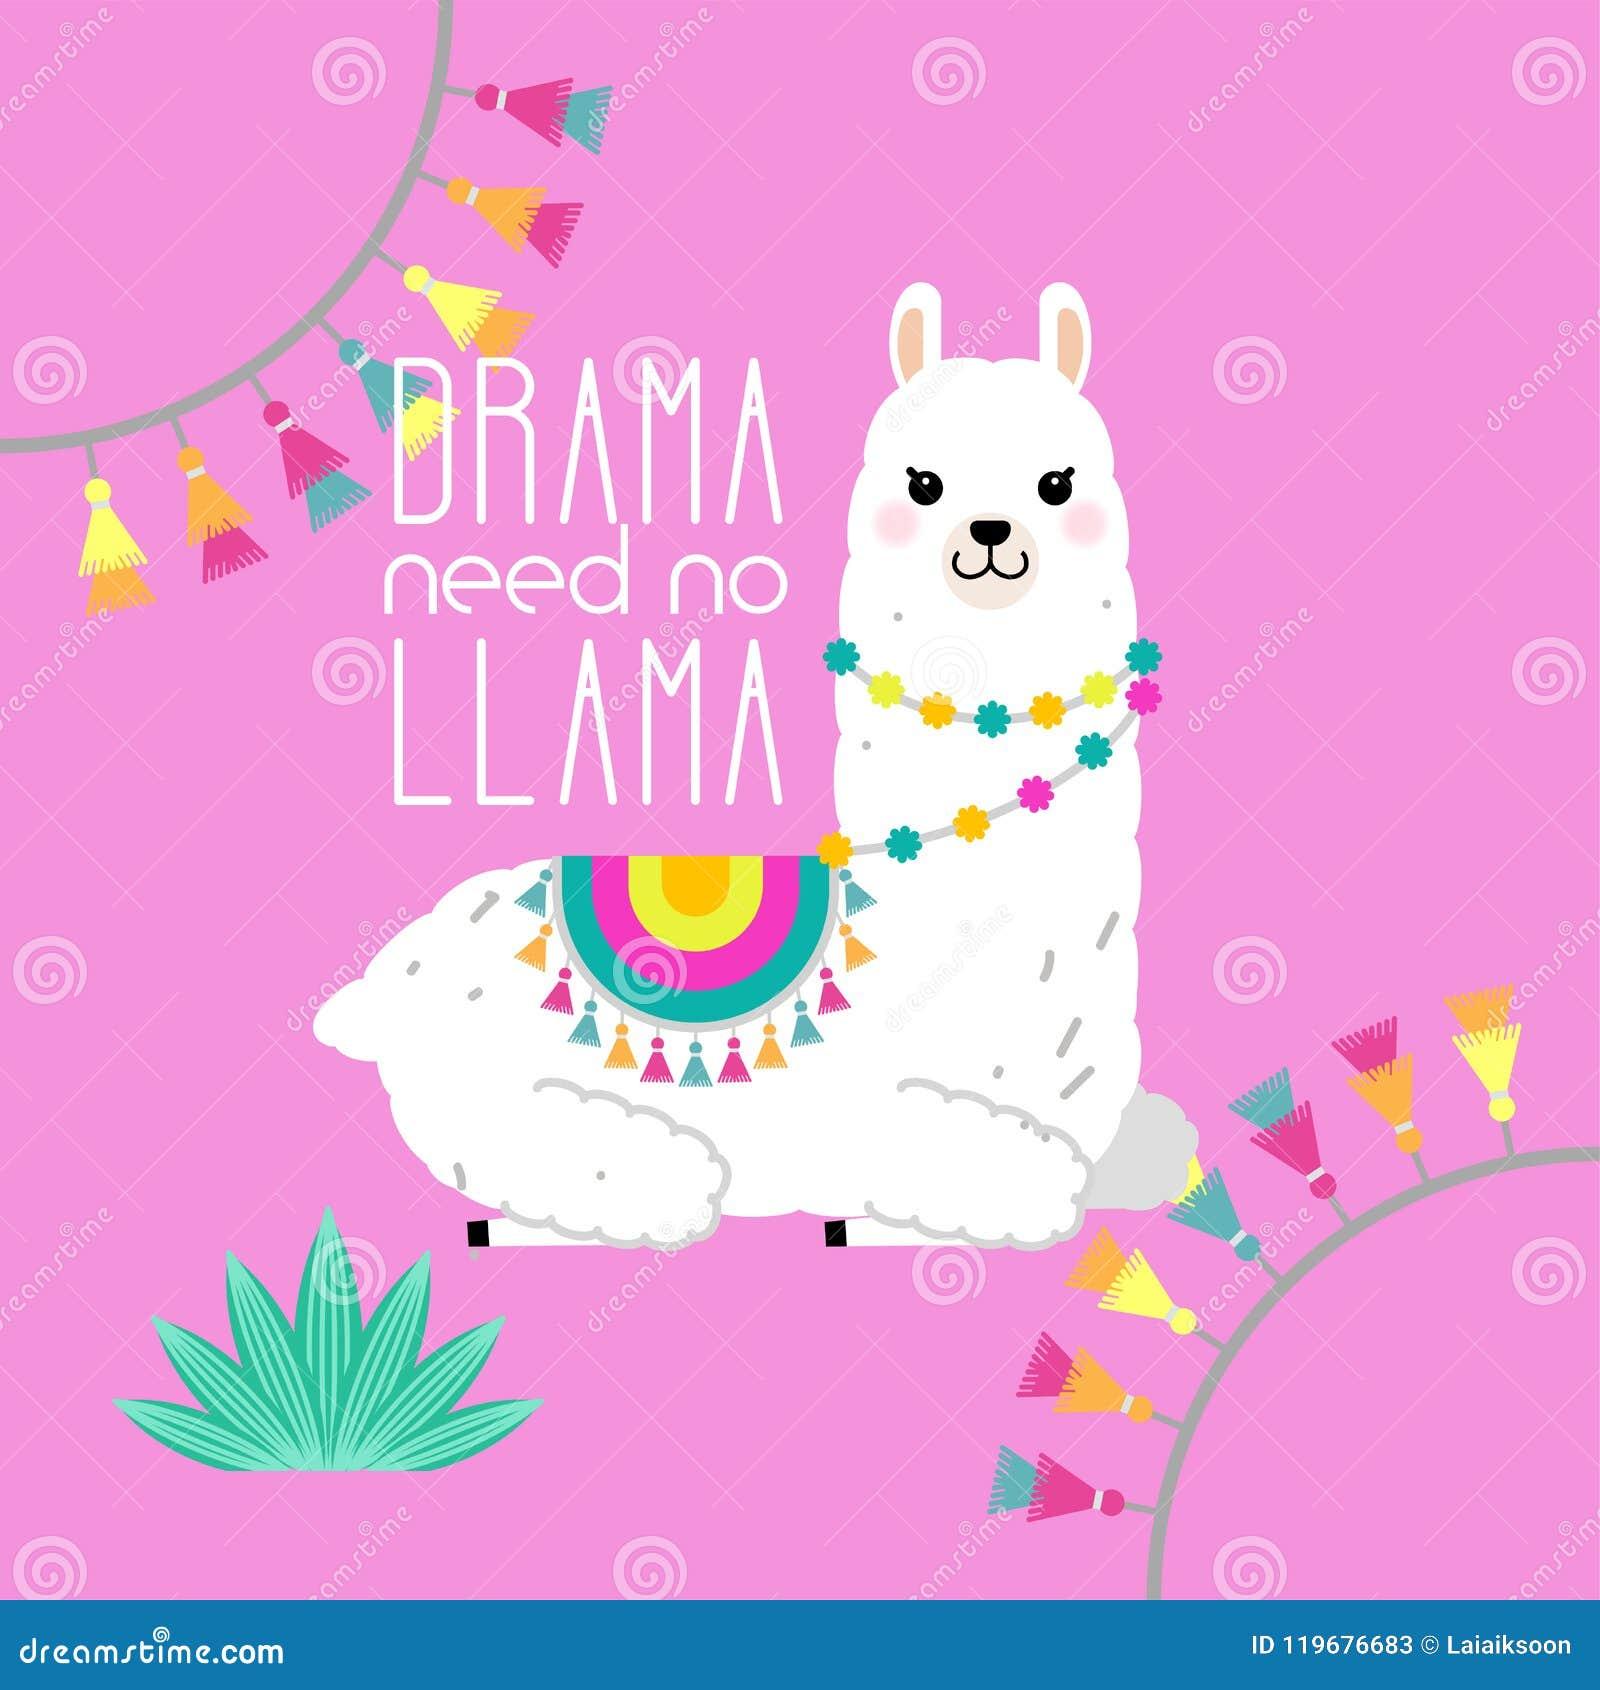 Cute Llama And Alpaca Illustration For Nursery Design